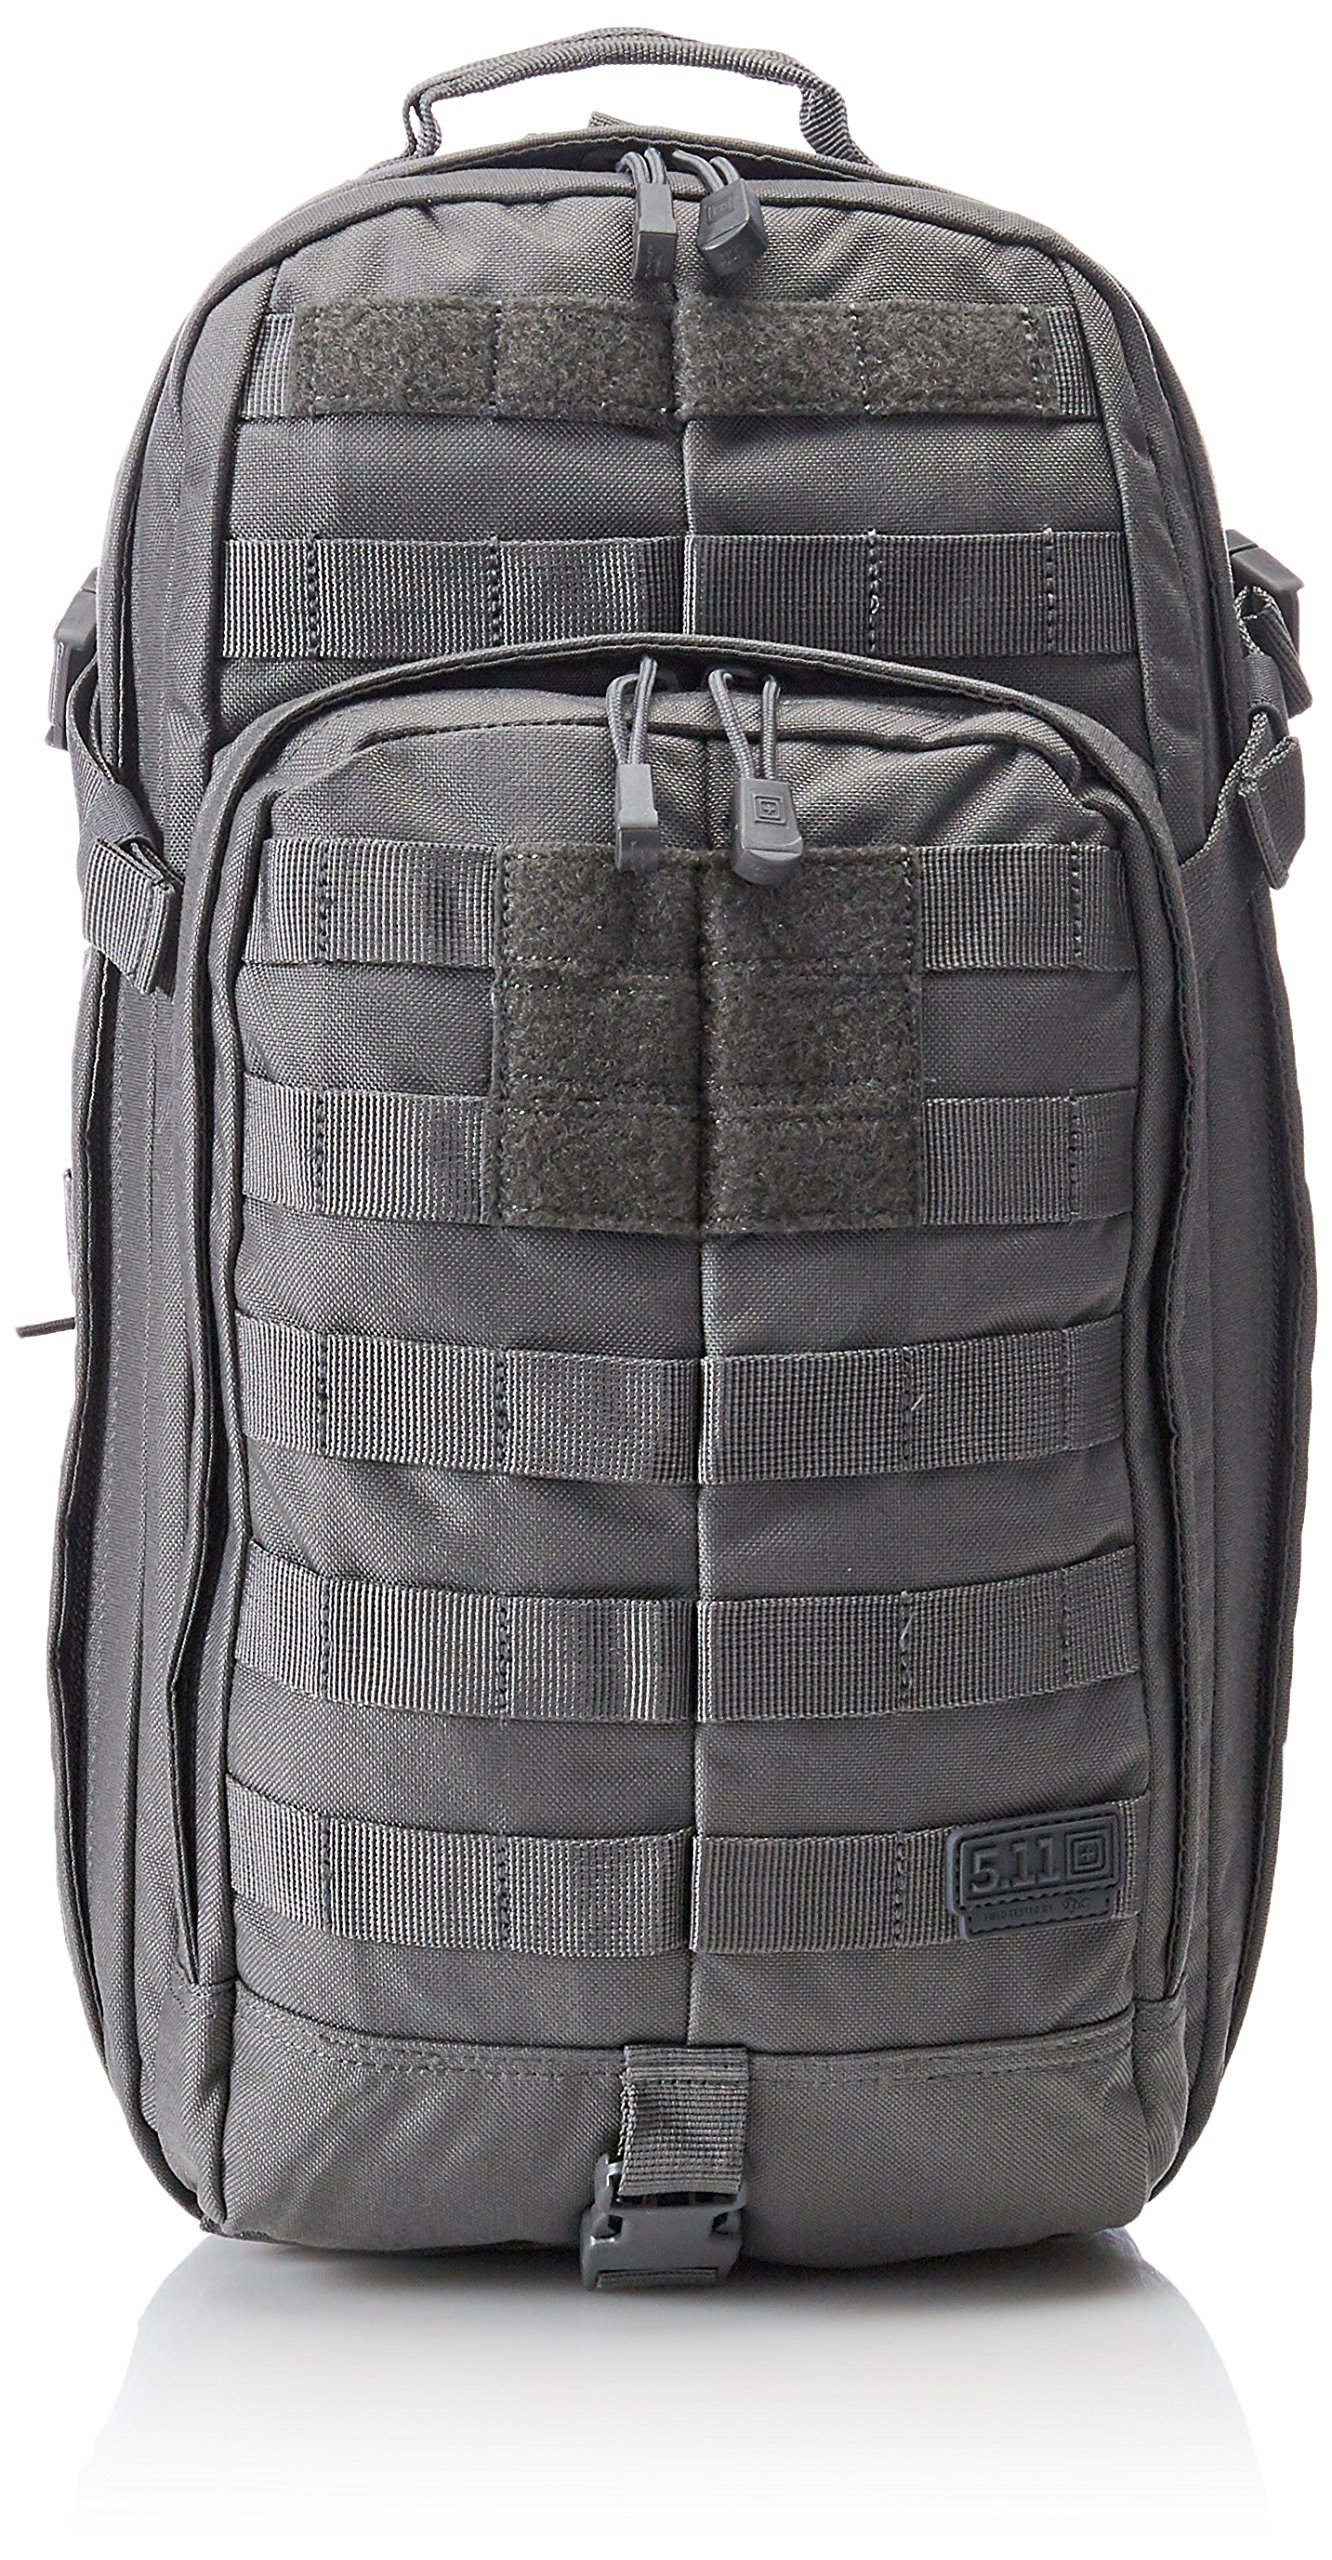 5.11 RUSH MOAB 10 Tactical Sling Bag Shoulder Pack Military Backpack, Style 56964, Storm